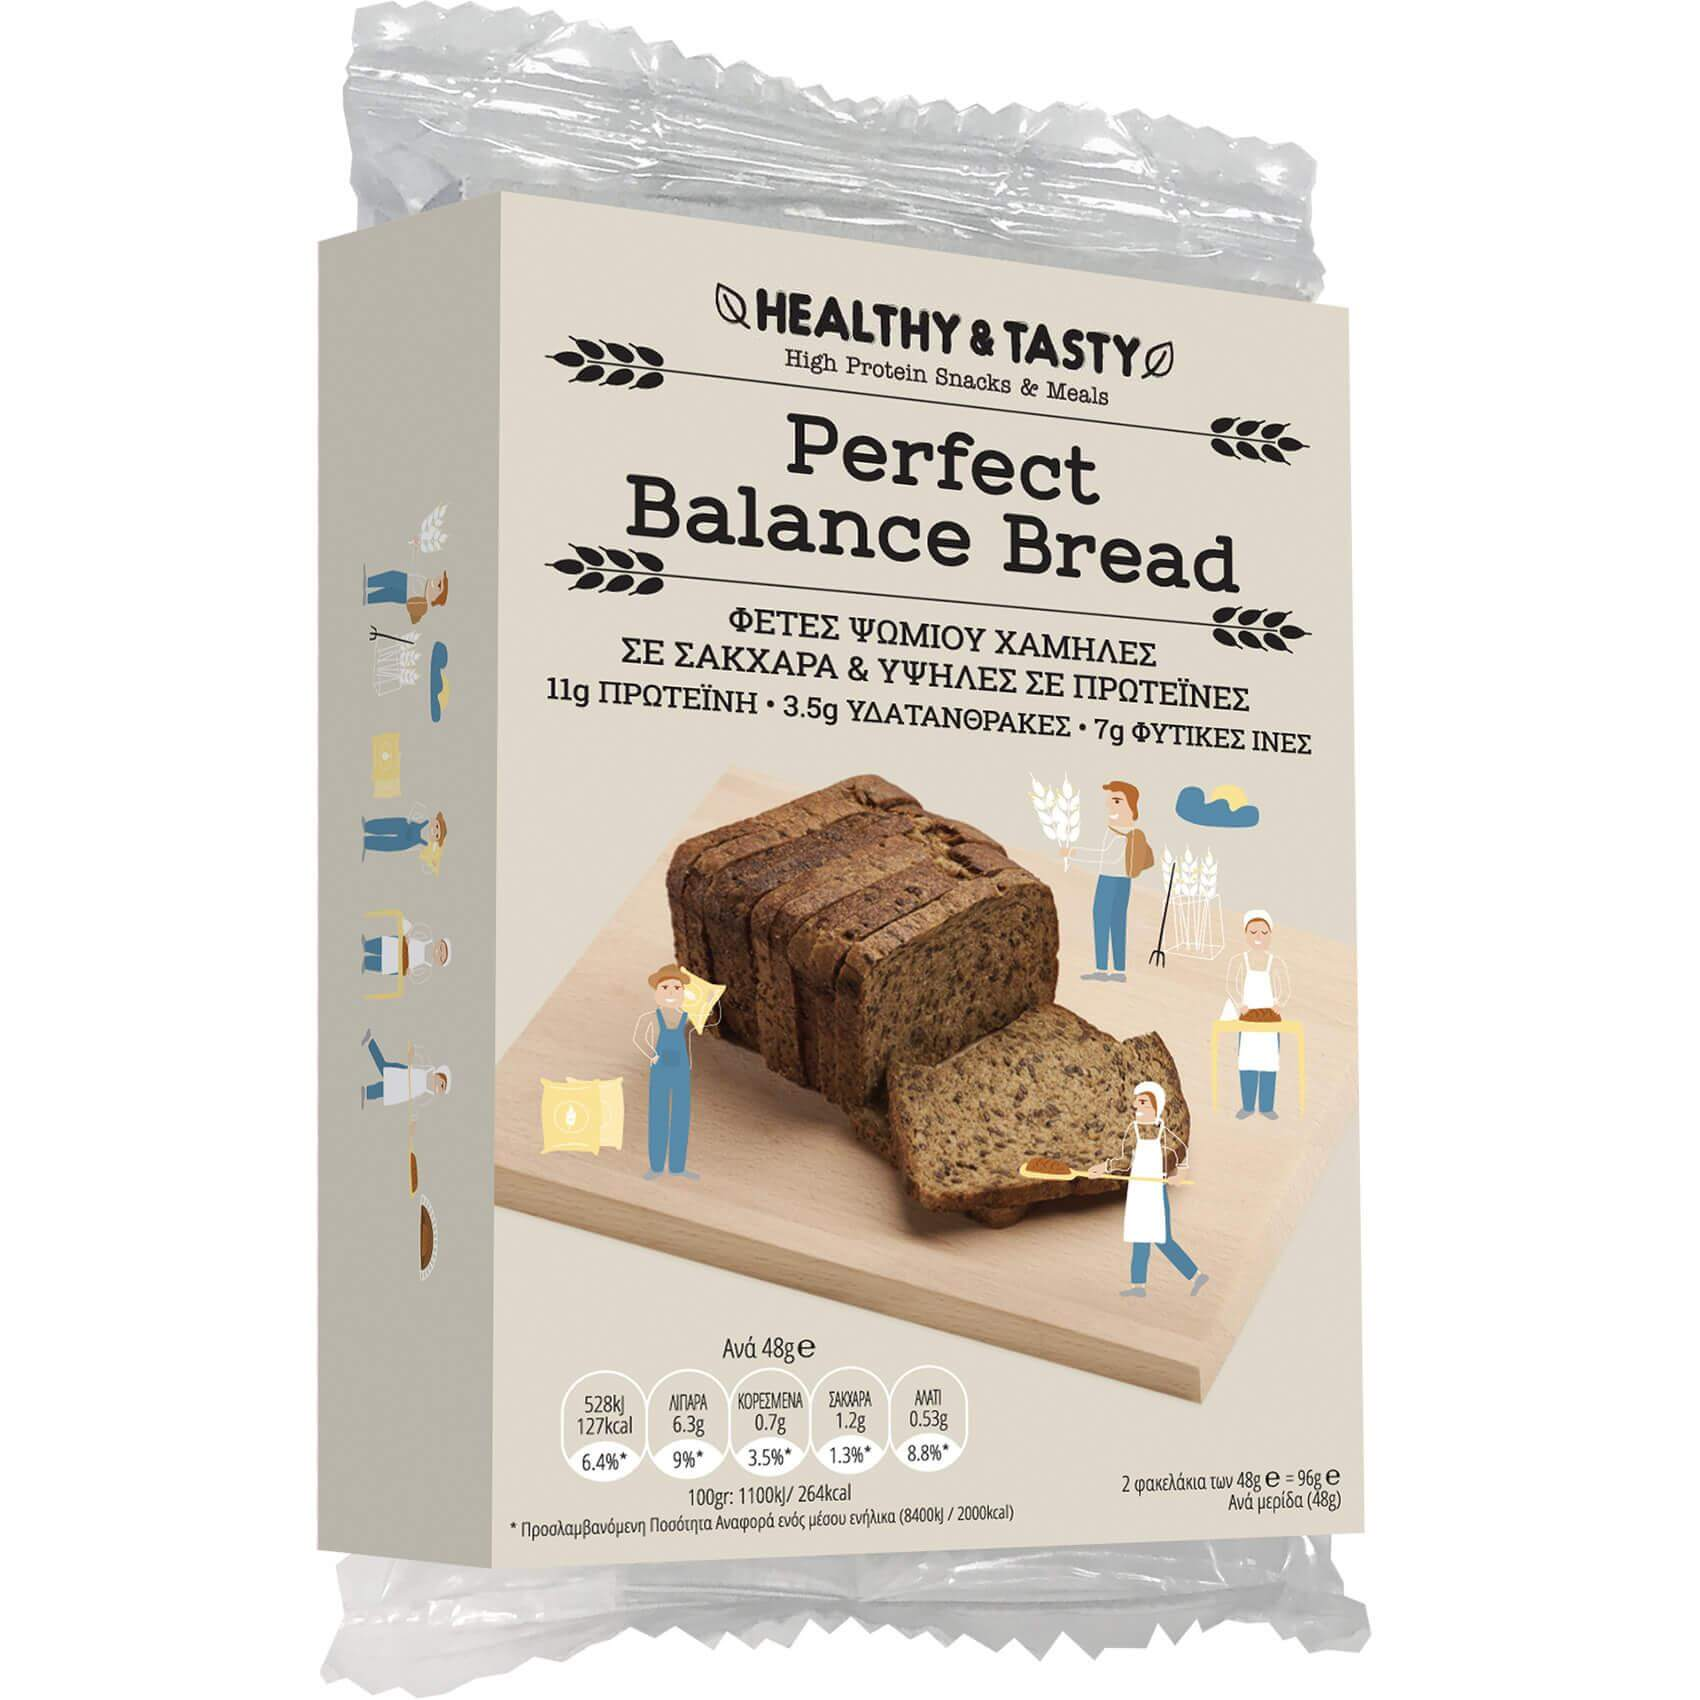 Power Health Perfect Balance Bread Φέτες Ψωμιού Χαμηλές σε Σάκχαρα & Υψηλές σε Πρωτεΐνες 2sachets x 48gr